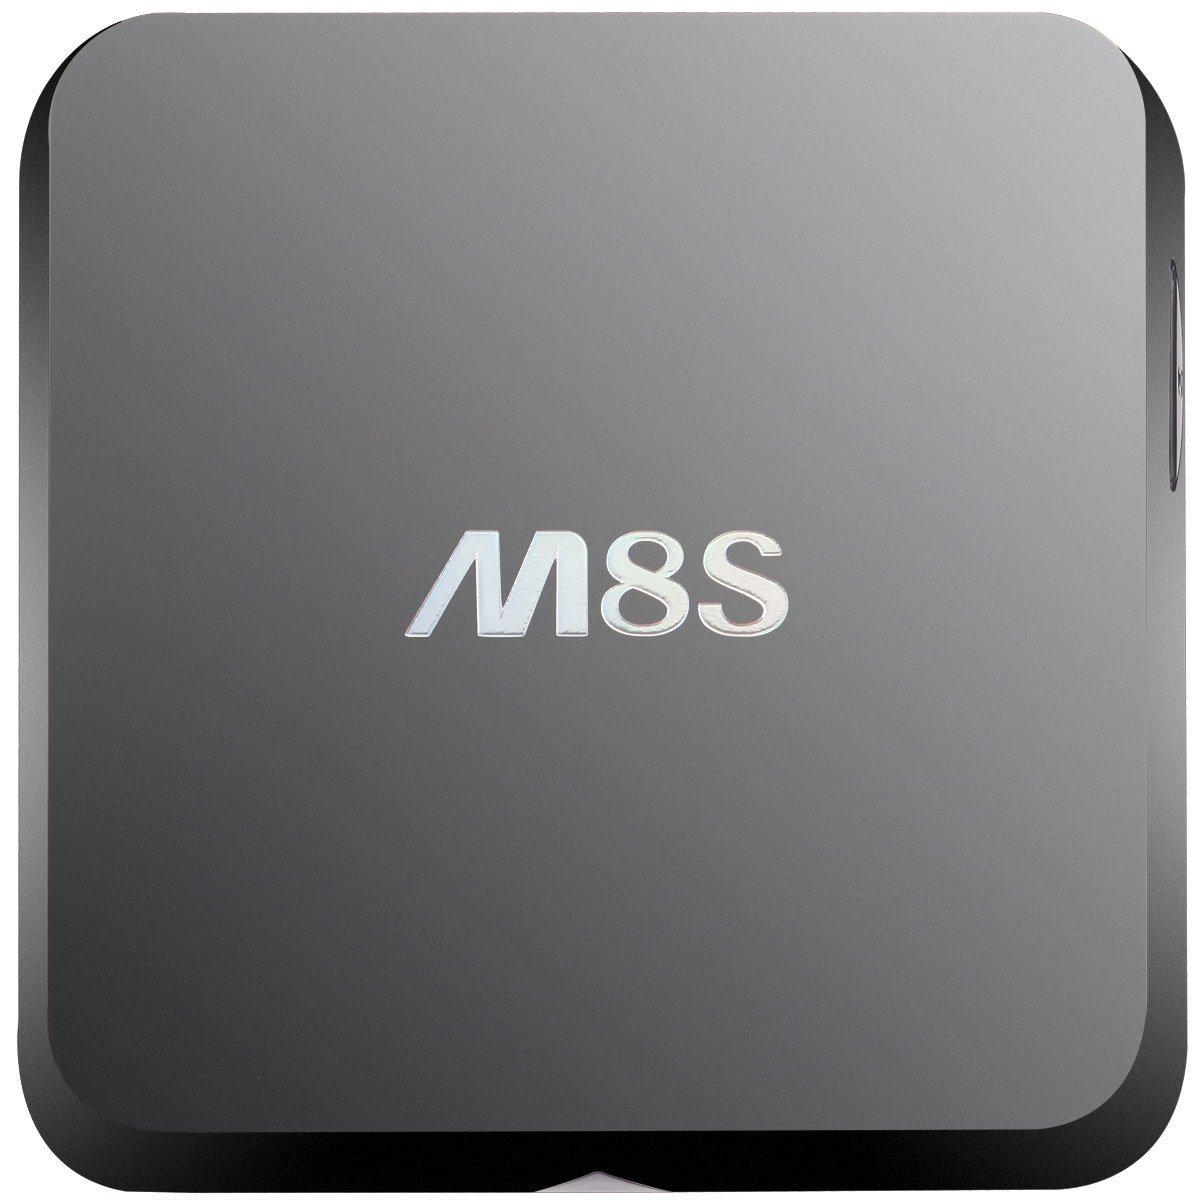 China OEM Logo on Android 5.1 Smart TV Box M8s Set Top Box